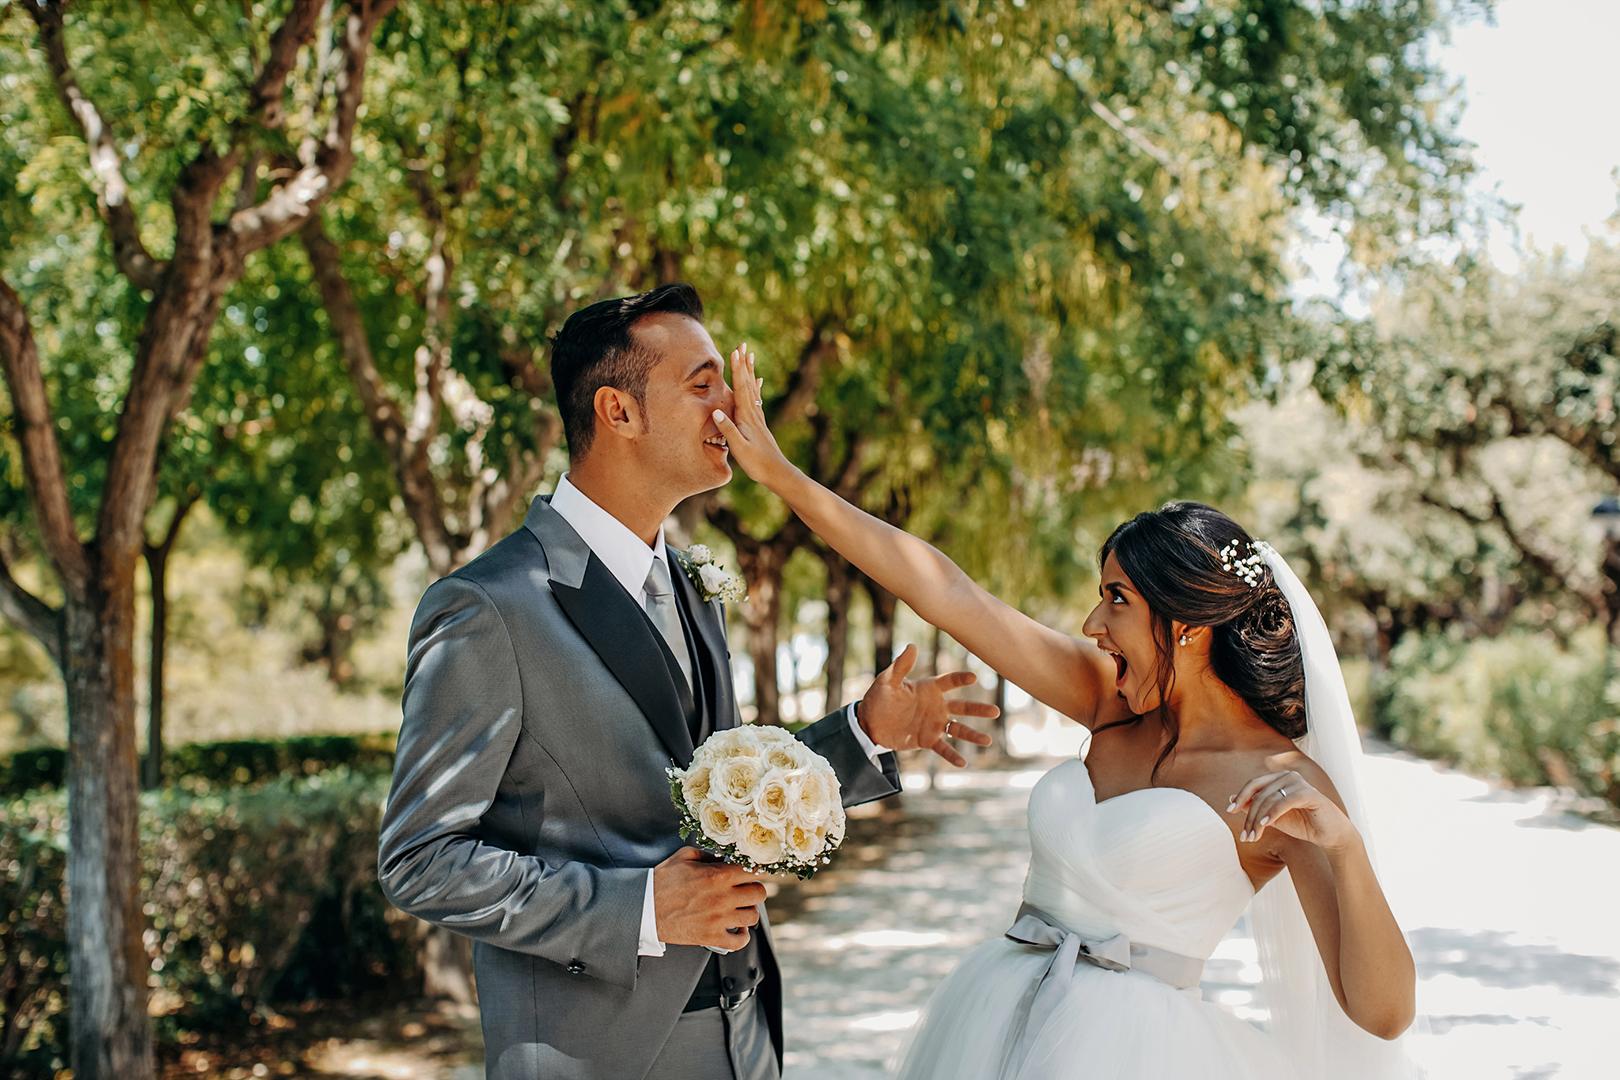 35 gianni-lepore-sposi-wedding-briede-groom-villa-comunale-lucera-fotografo